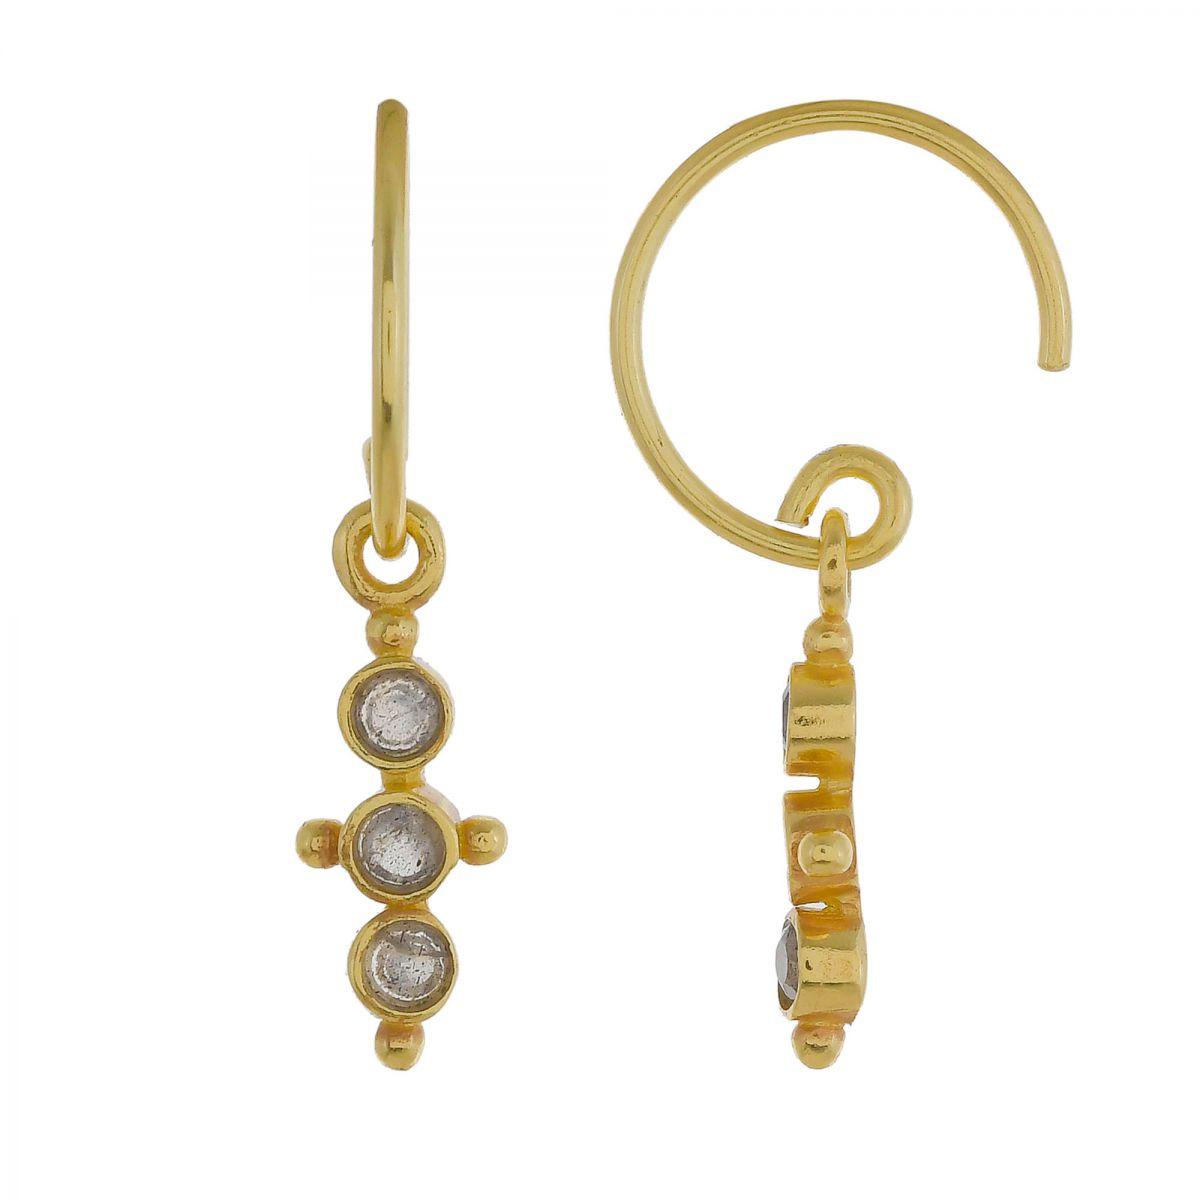 f earring three little hanging labradorite stones g pl